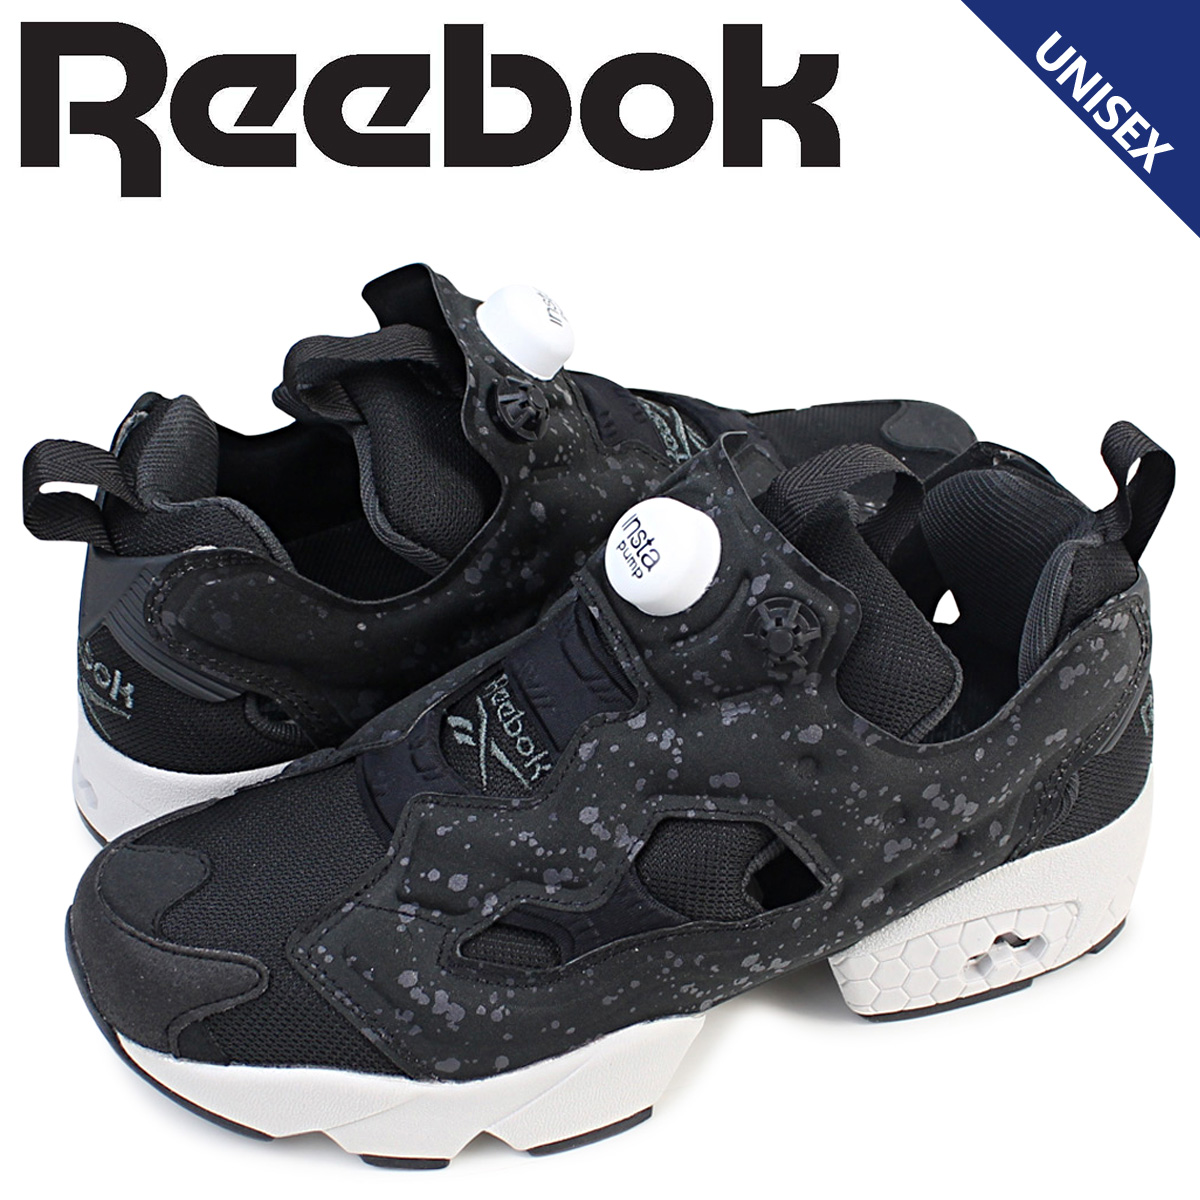 mex reebok pump review